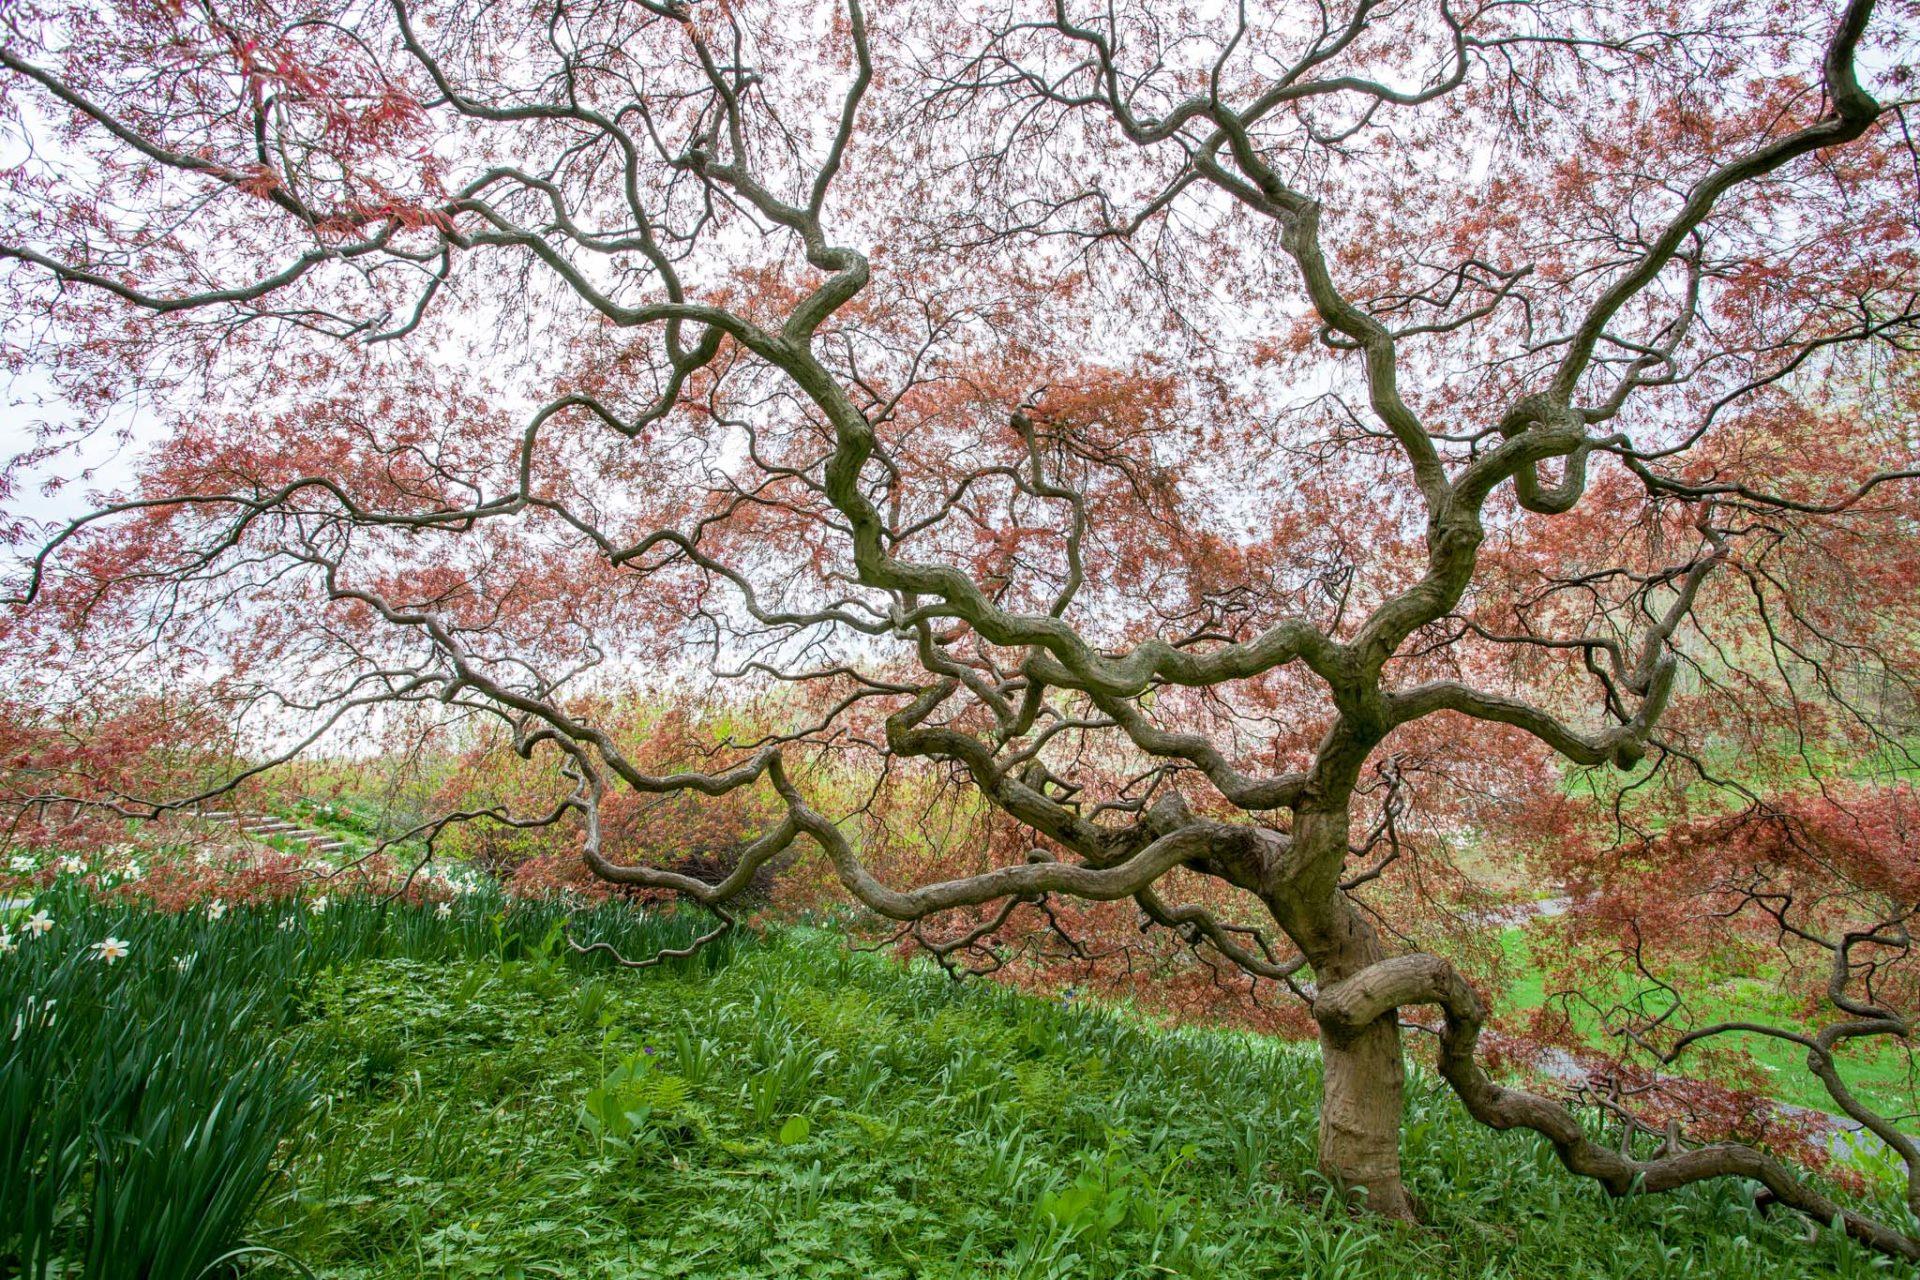 Acer palmatum dissectum atropurpureum, Red Cutleaf Japanese Maple tree, spring leaves unfolding, Winterthur Garden